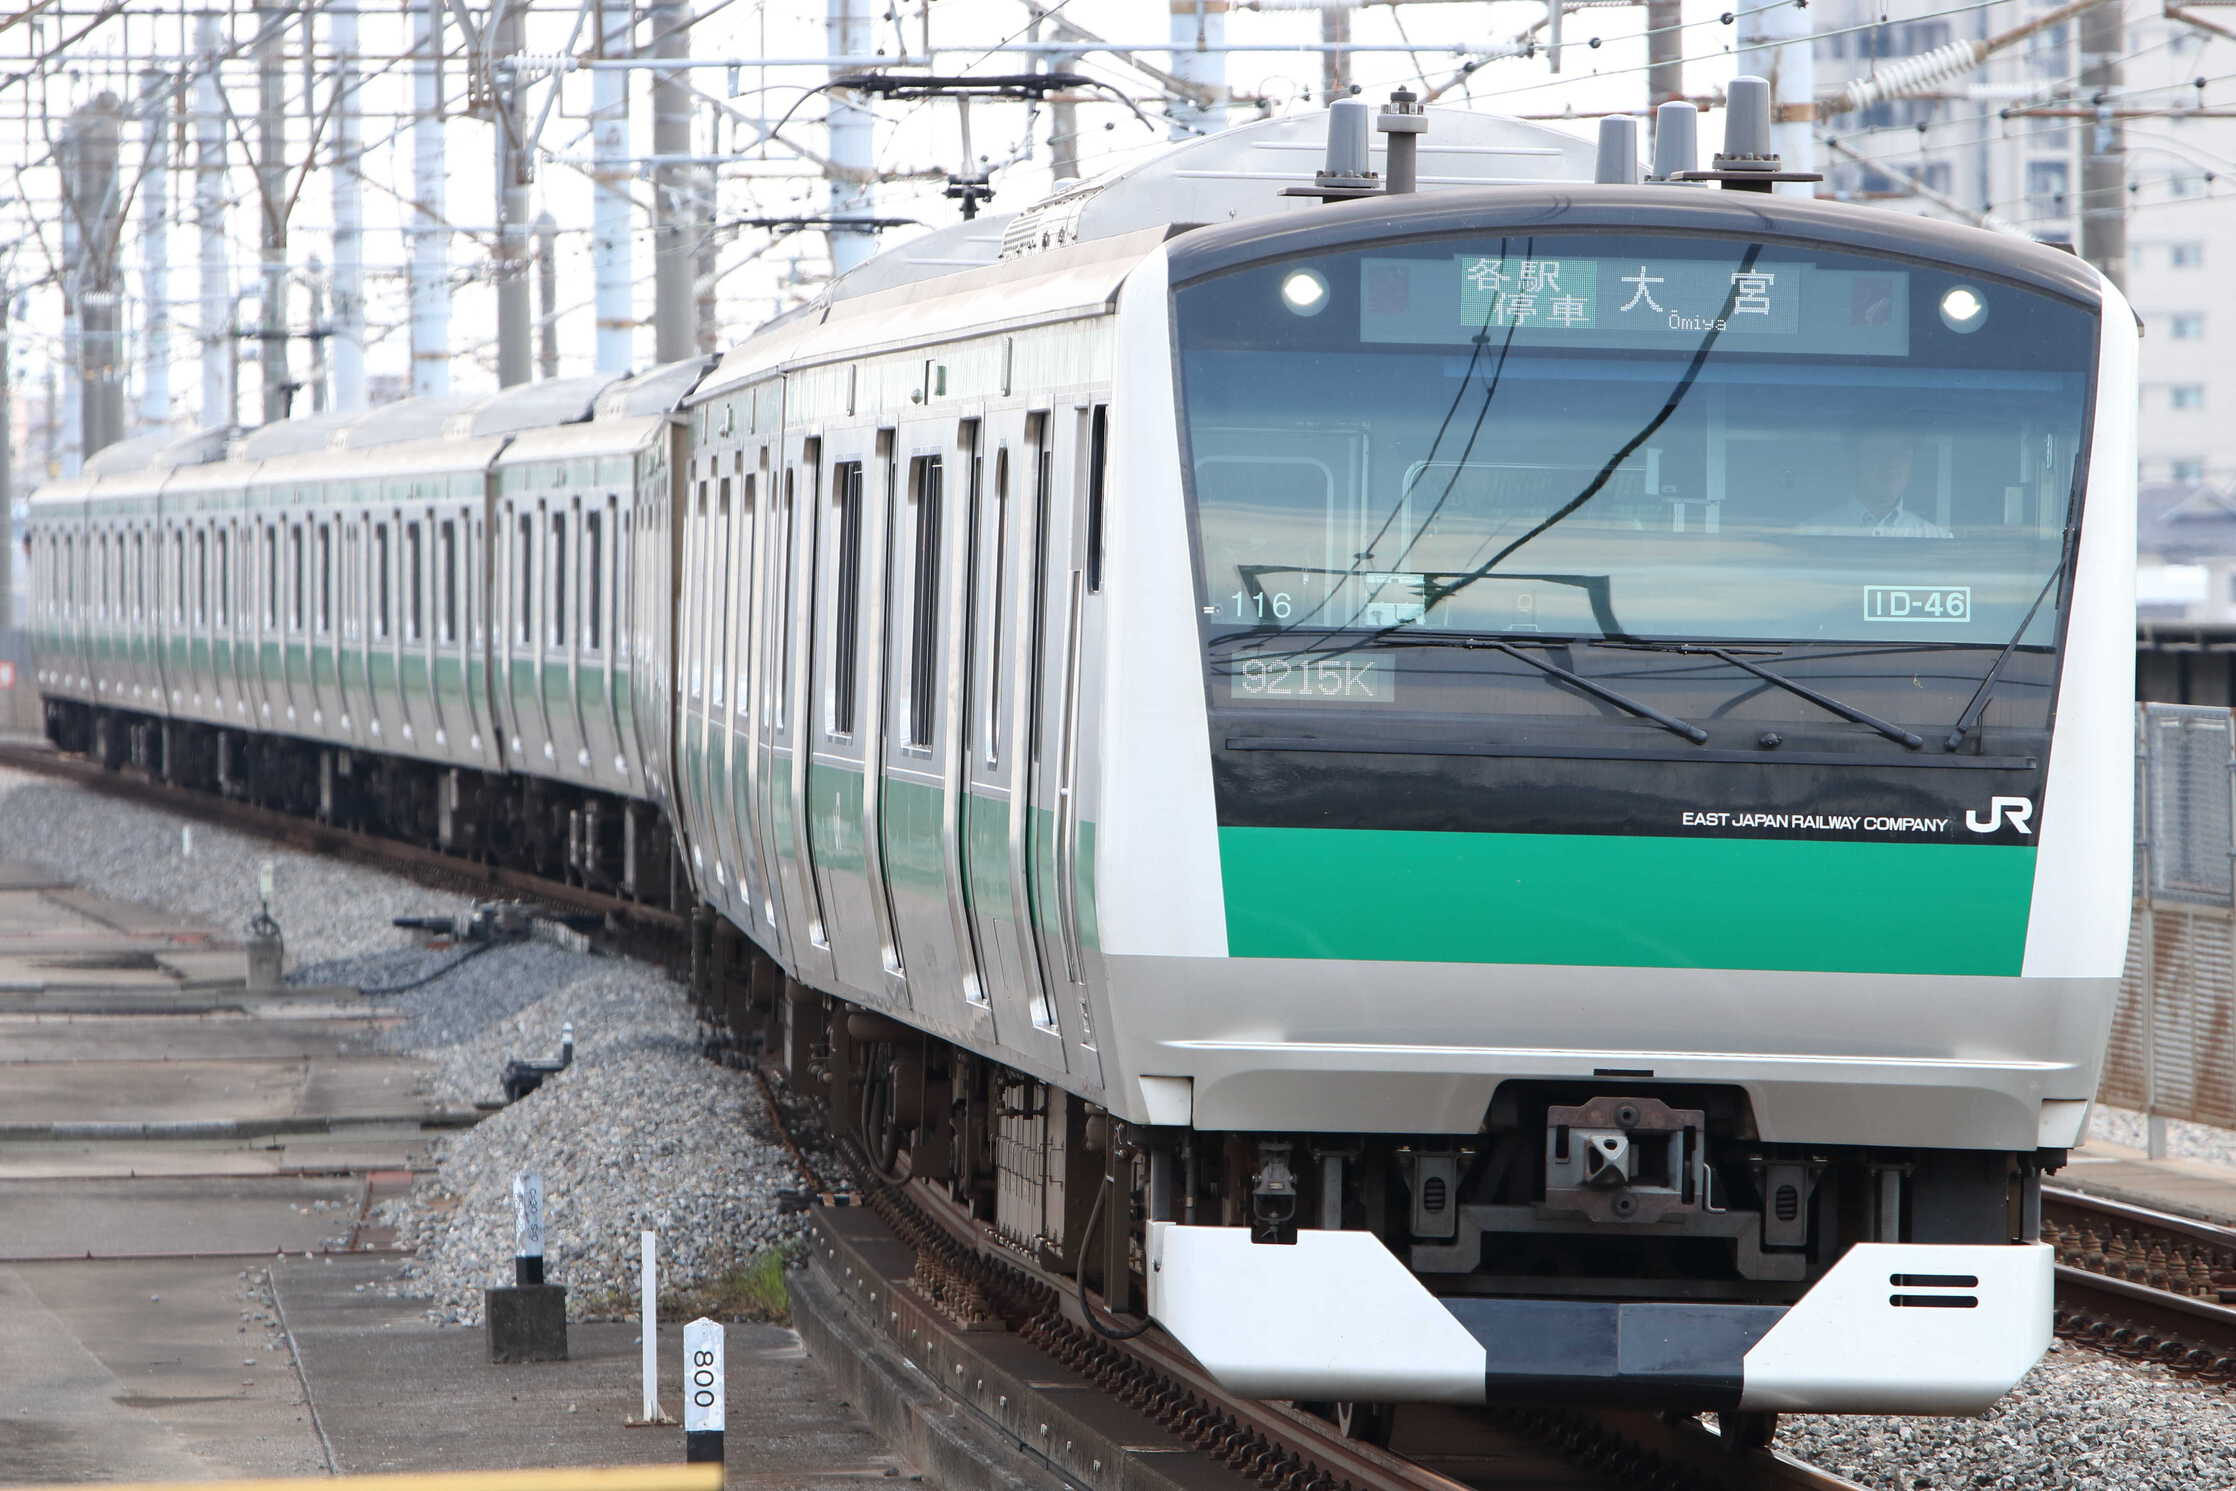 9215K(シク〜オオ) 渋谷駅線路切り替え工事に伴う臨時列車 E233系 宮ハエ116編成